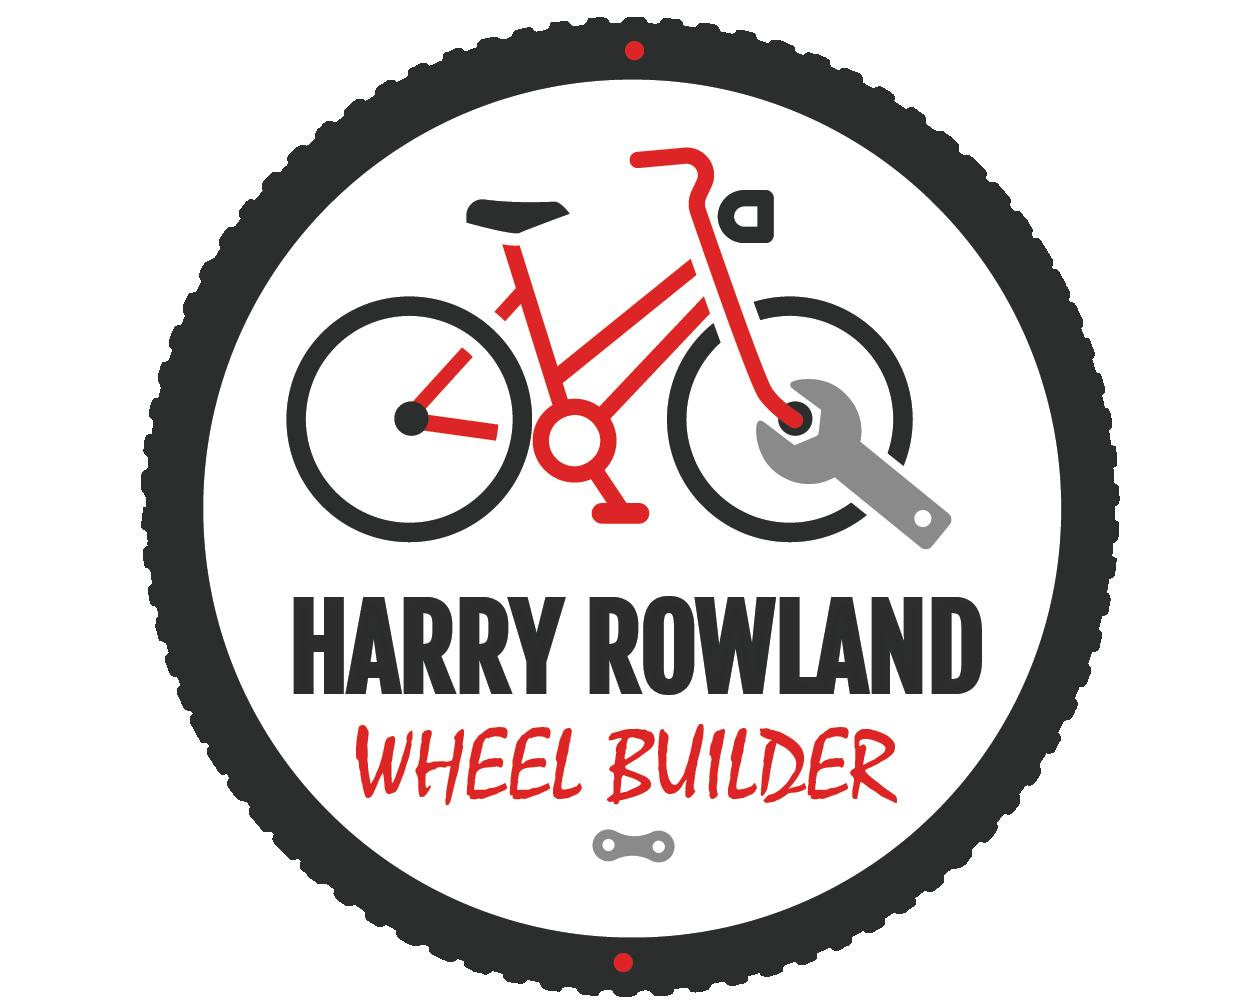 Harry Rowland Cycle Wheel Builder Kent